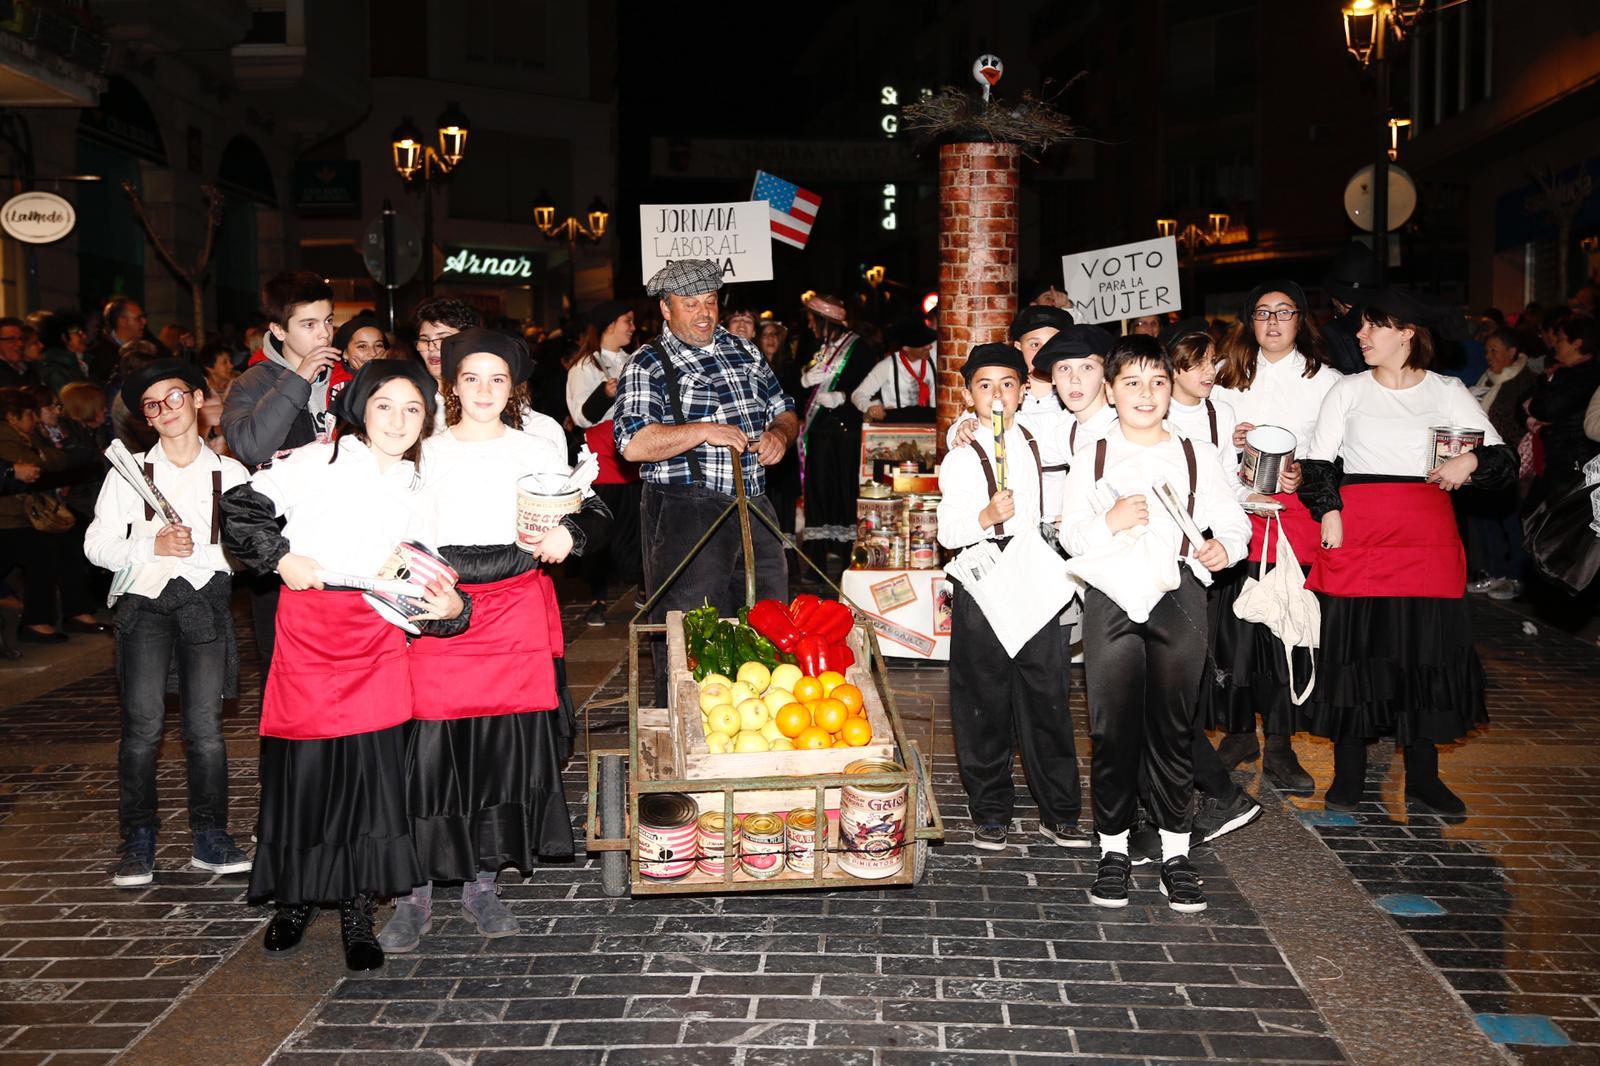 La historia protagonizó el desfile calagurritano